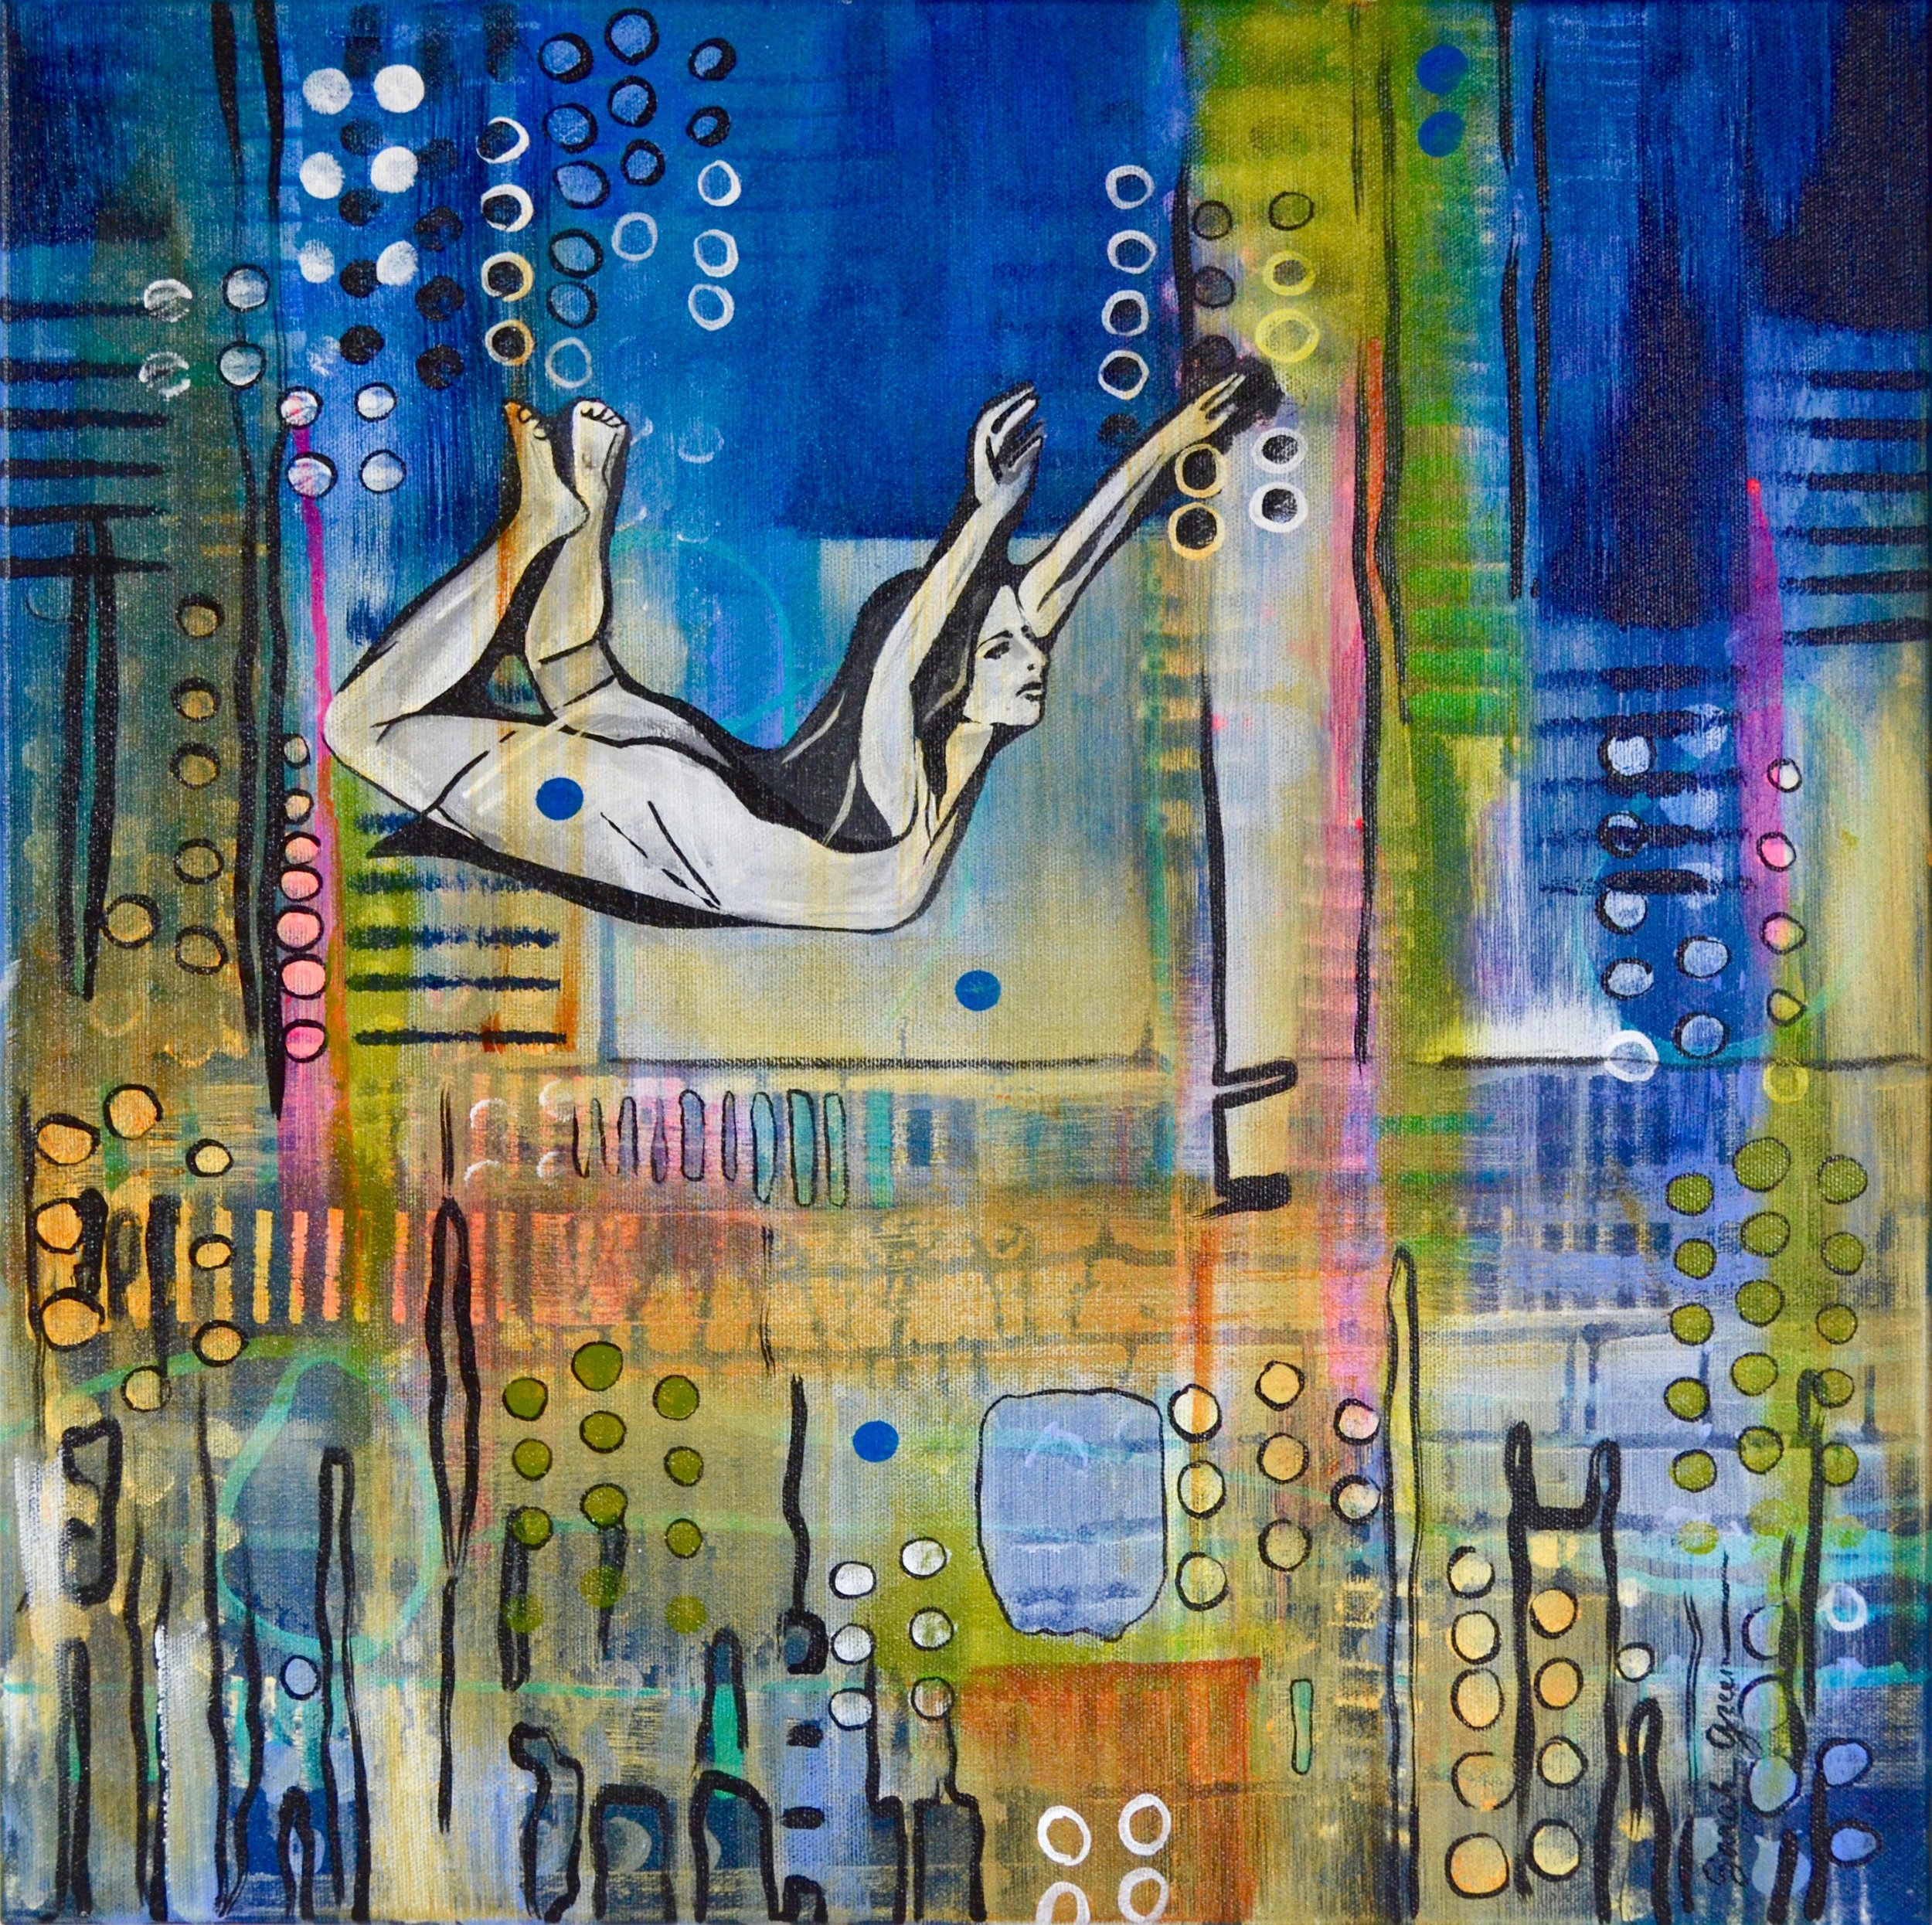 Strip Off the Shadows  | 18 x 18 inch acrylic on canvas